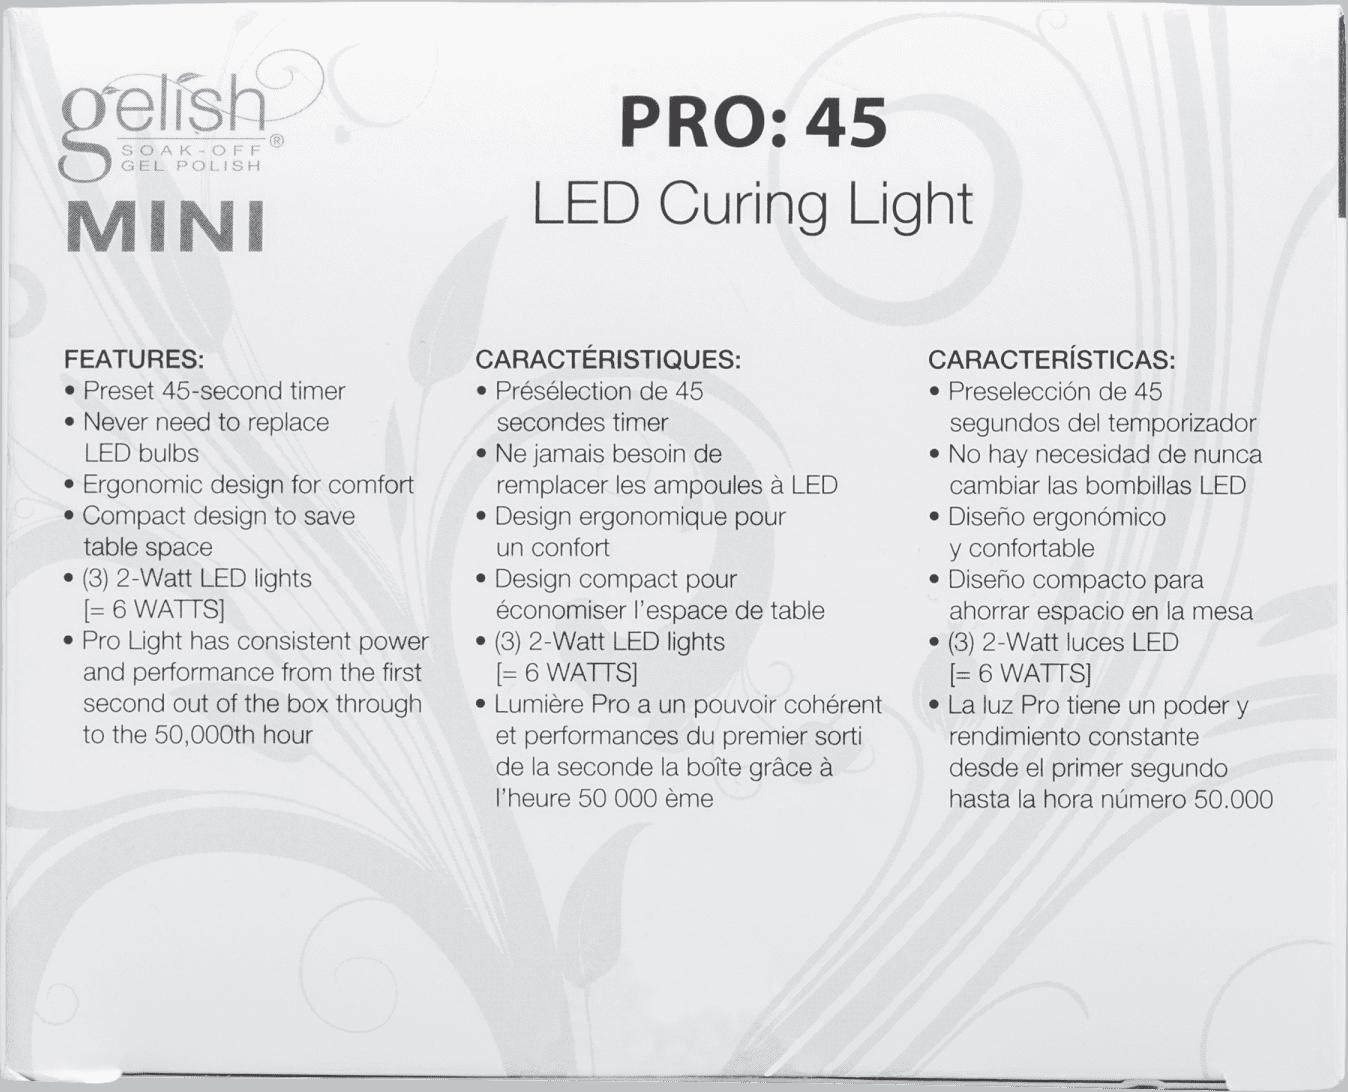 26a355dbe5668 Gelish Mini Pro 45 LED Curing Light - Cabine para Unha em Gel